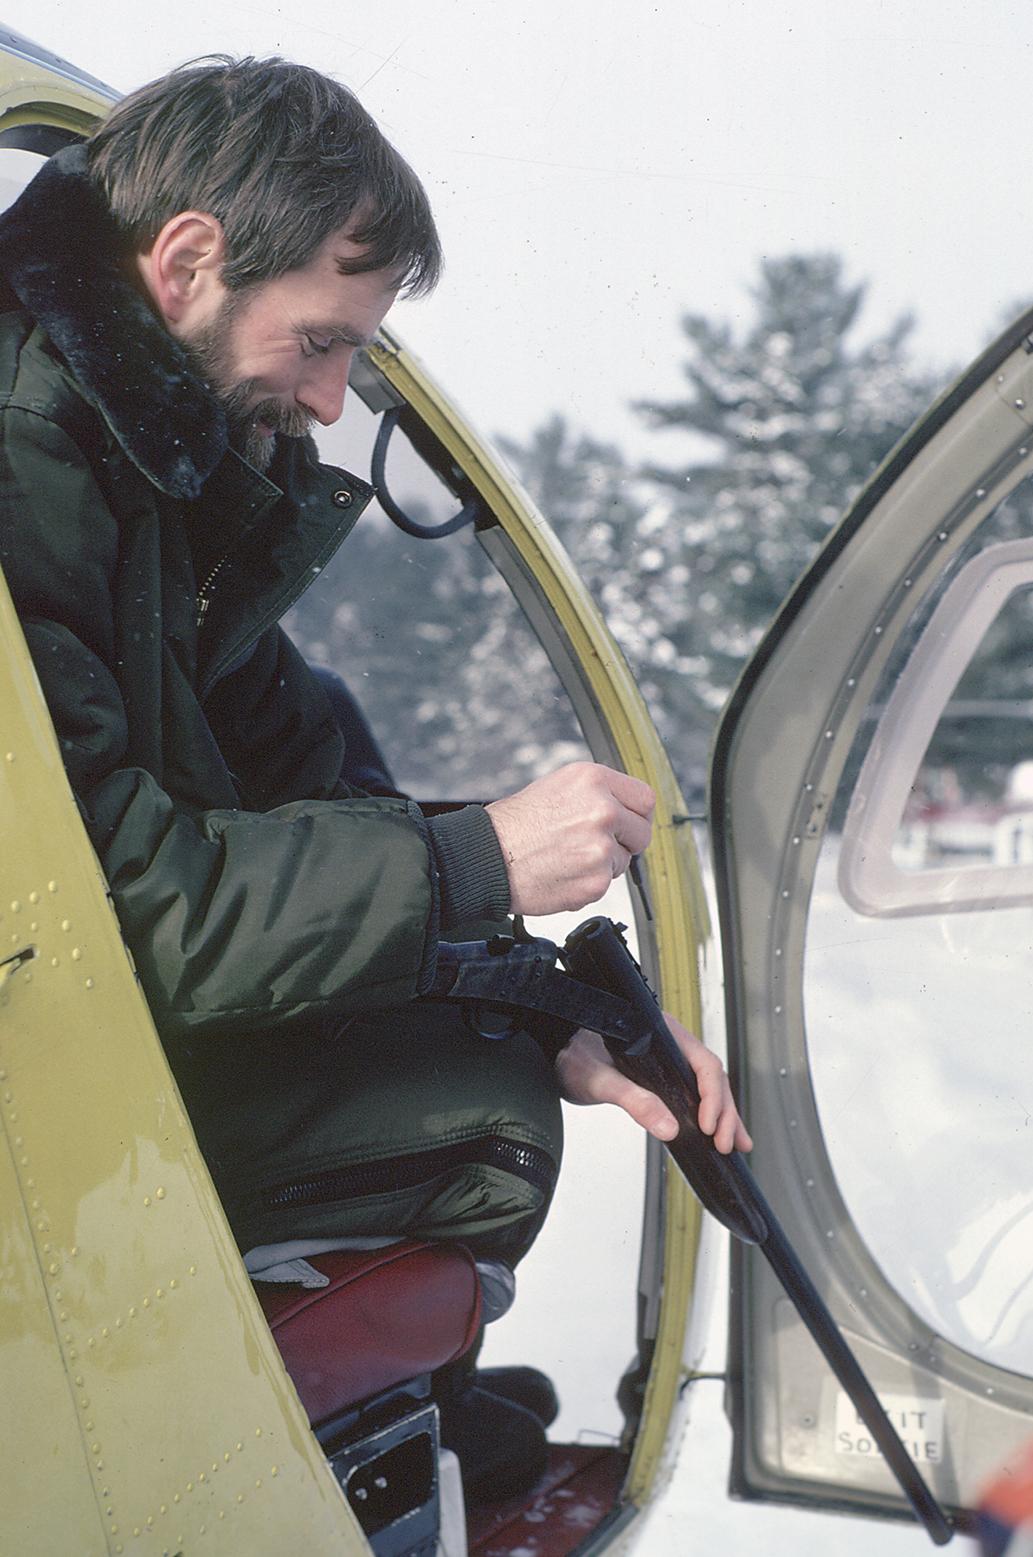 Michigan Department of Natural Resources wildlife veterinarian Steve Schmitt loads tranquilizing darts into a rifle.